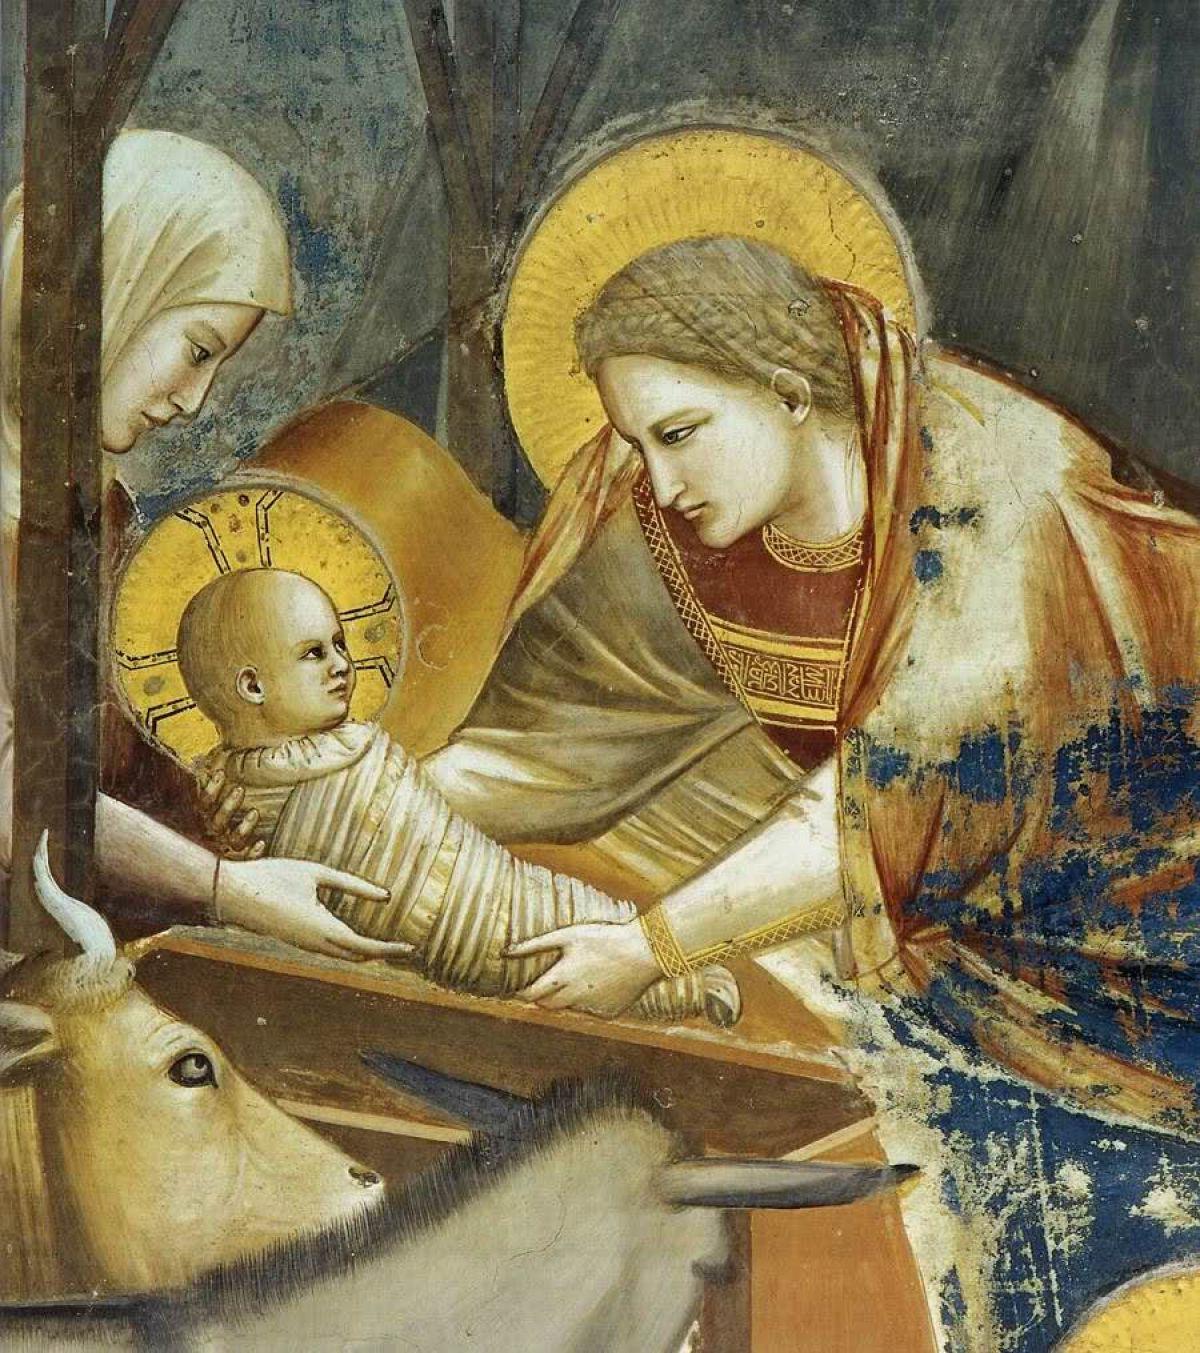 giotto-di-bondone-no.-17-scenes-from-the-life-of-christ-1.-nativity-birth-of-jesus-detail